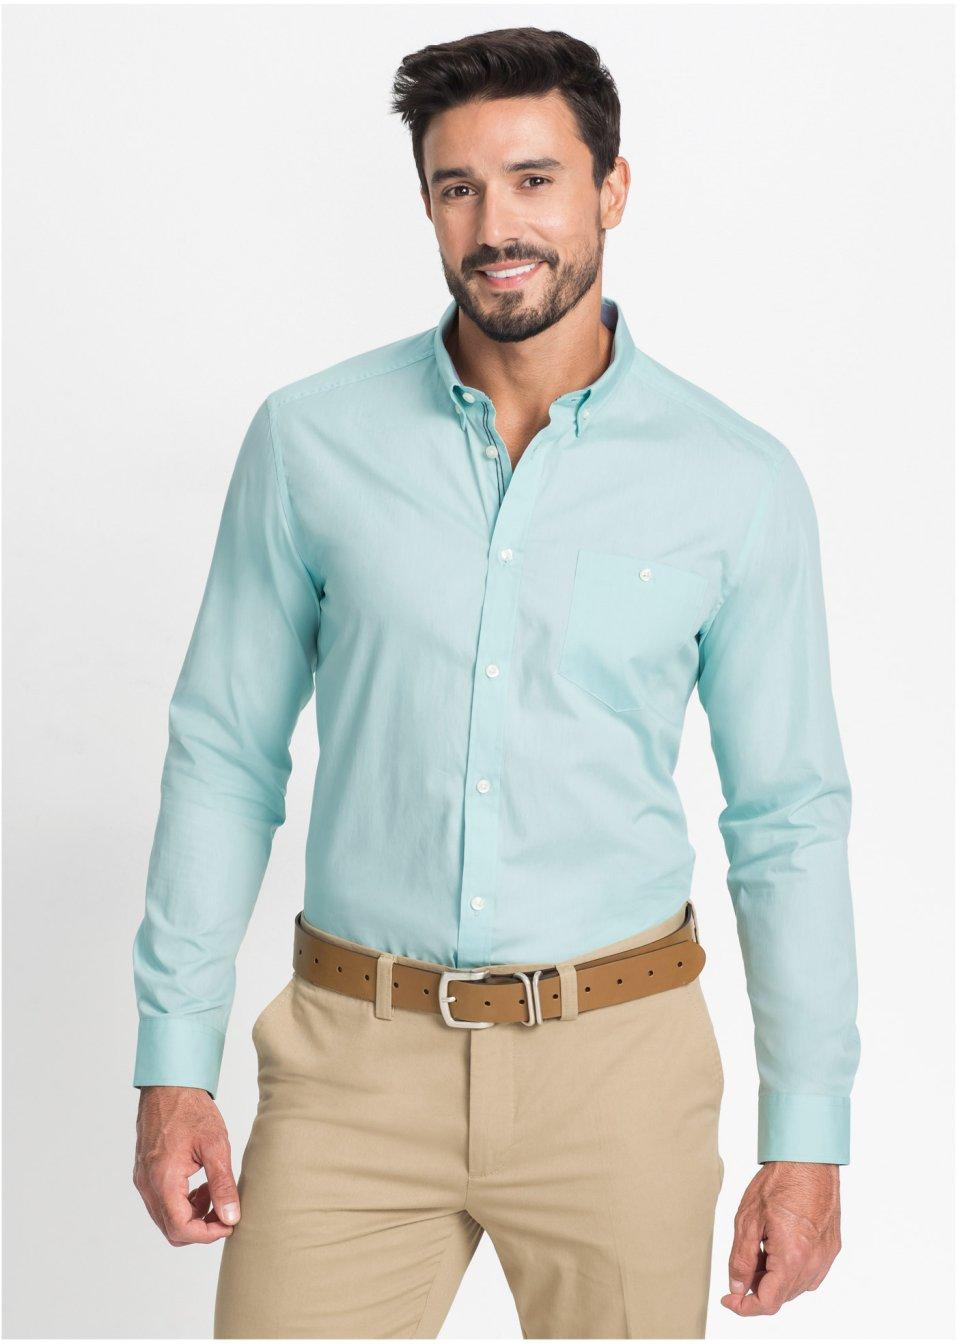 Chemise manches longues turquoise clair homme bpc - Bonprix herrenhemden ...